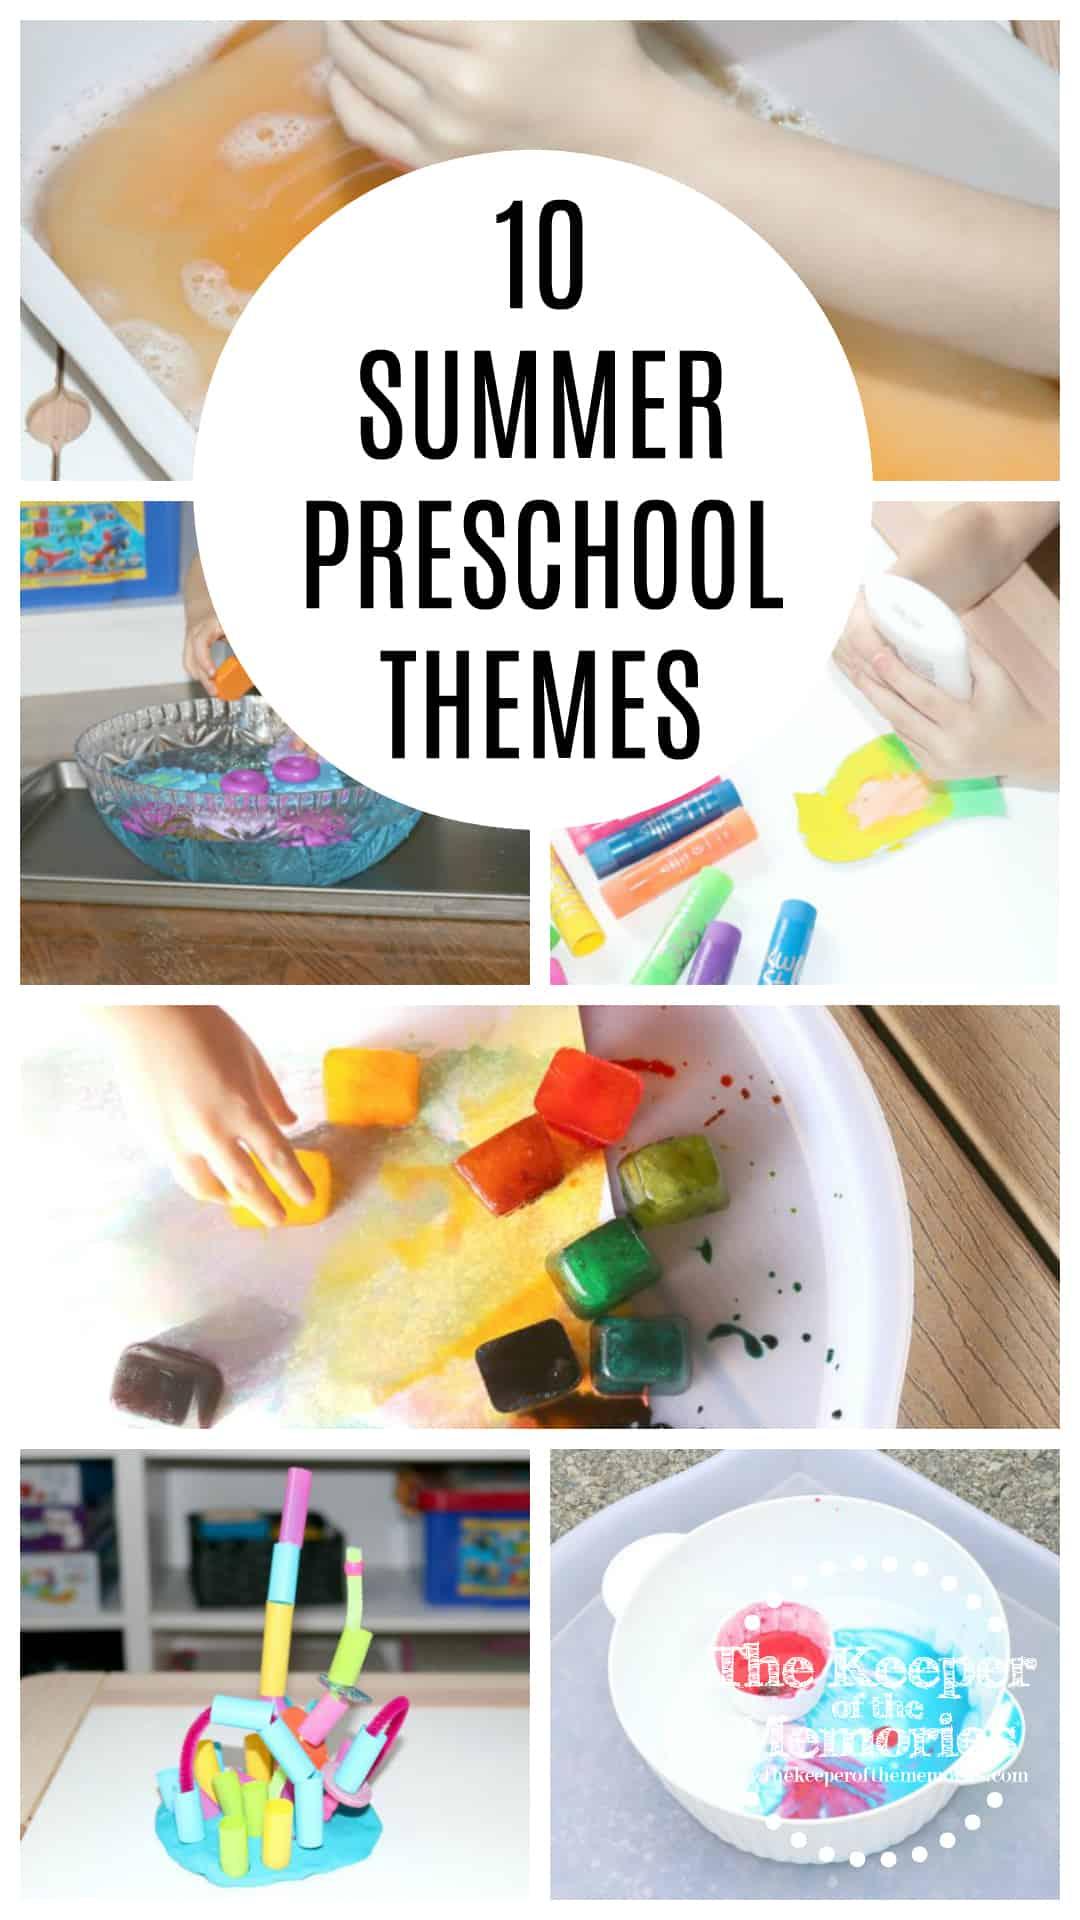 10+ Summer Preschool Monthly Themes